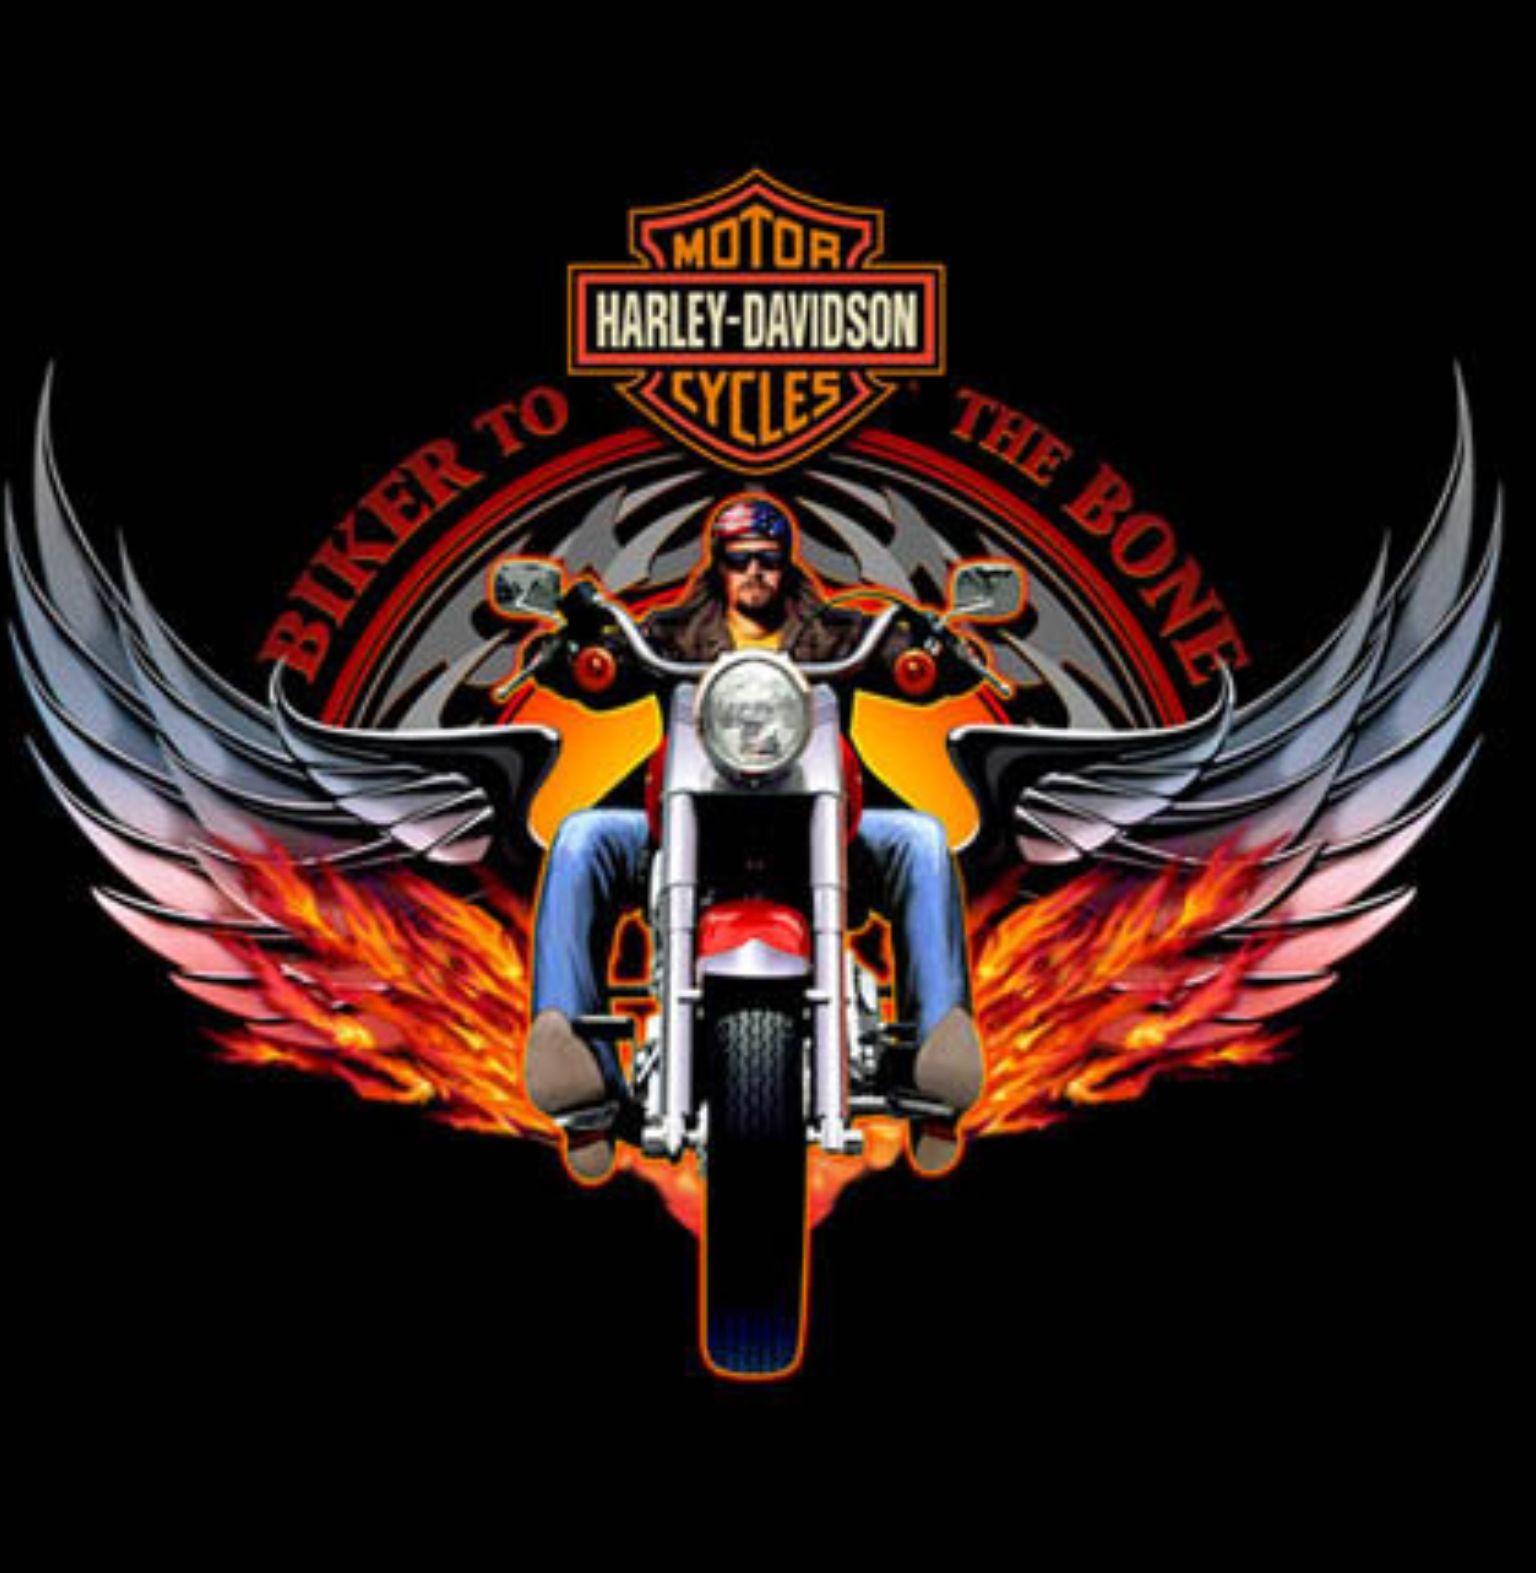 Compliments Of Uhl Studios Very Impressive Work Harley Davidson